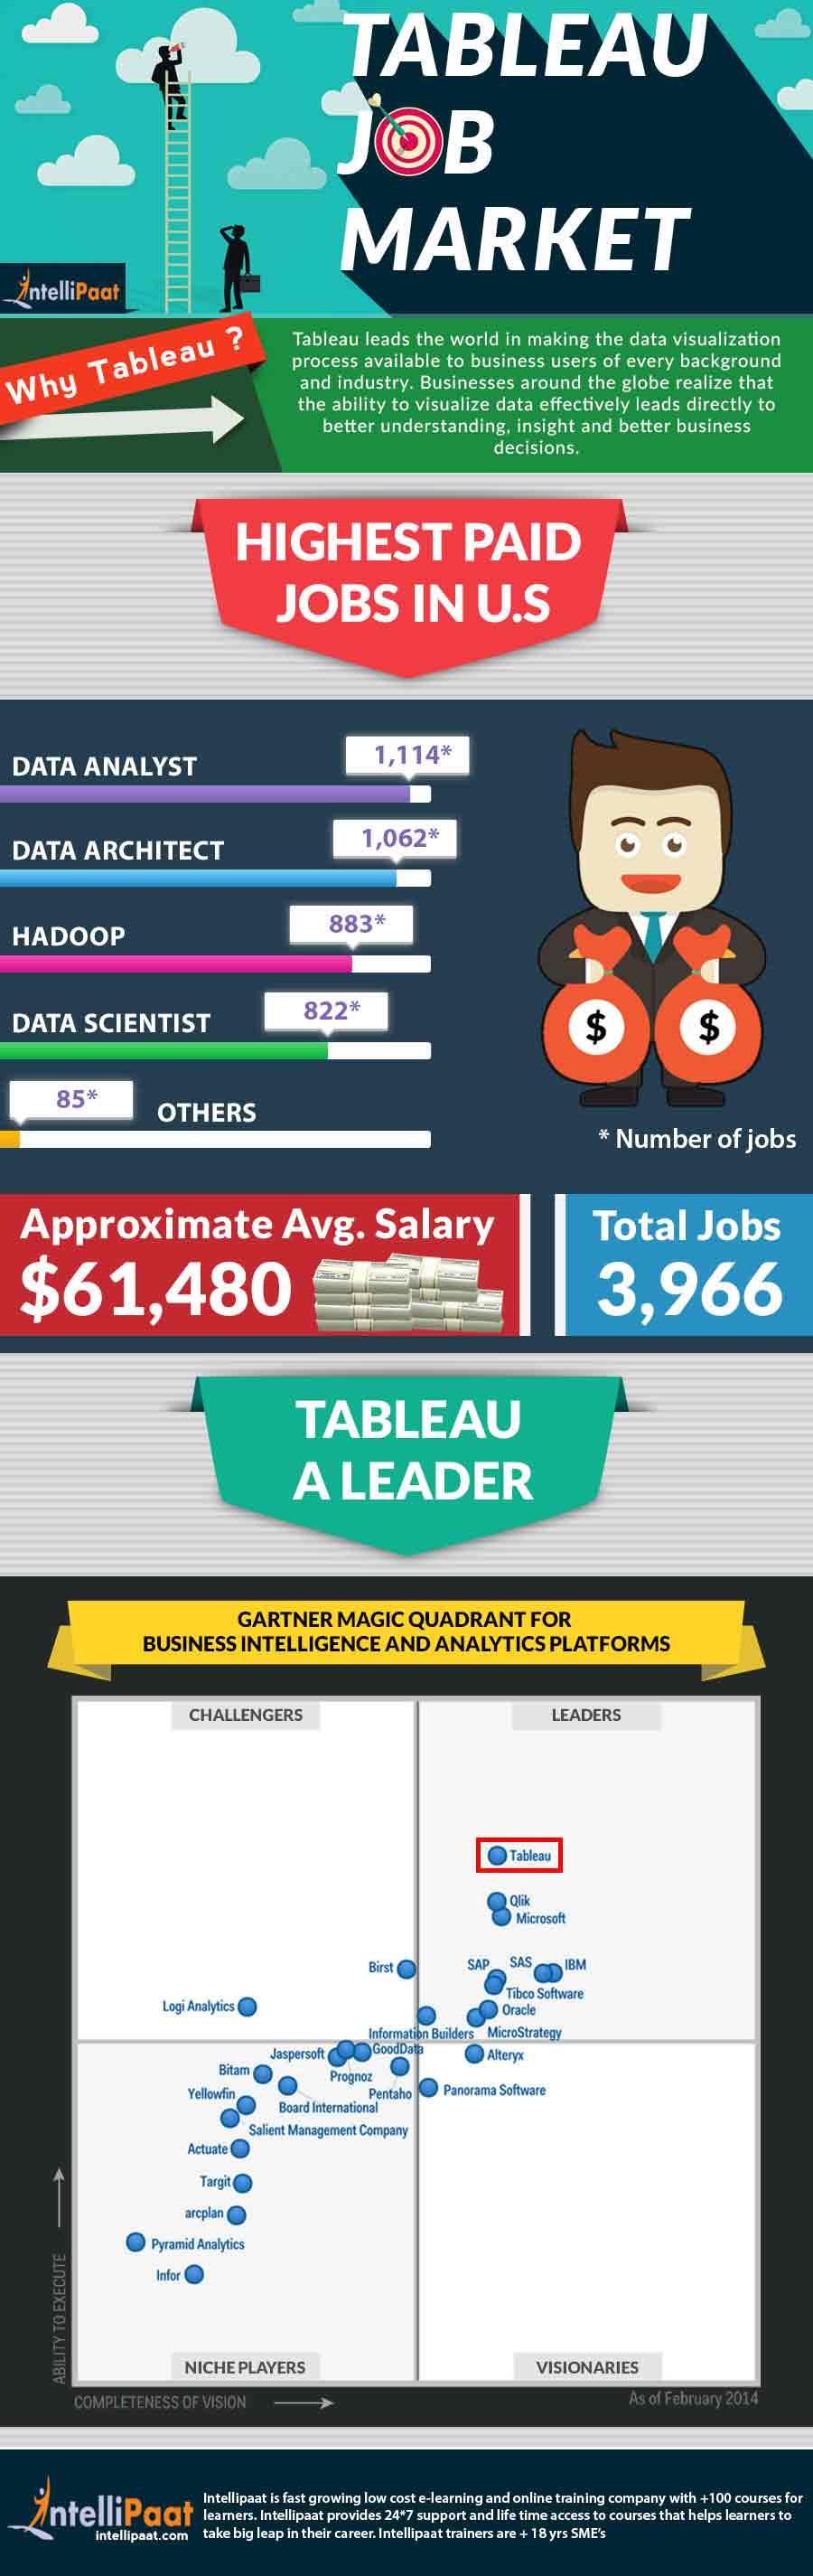 Tableau-Job-Market1